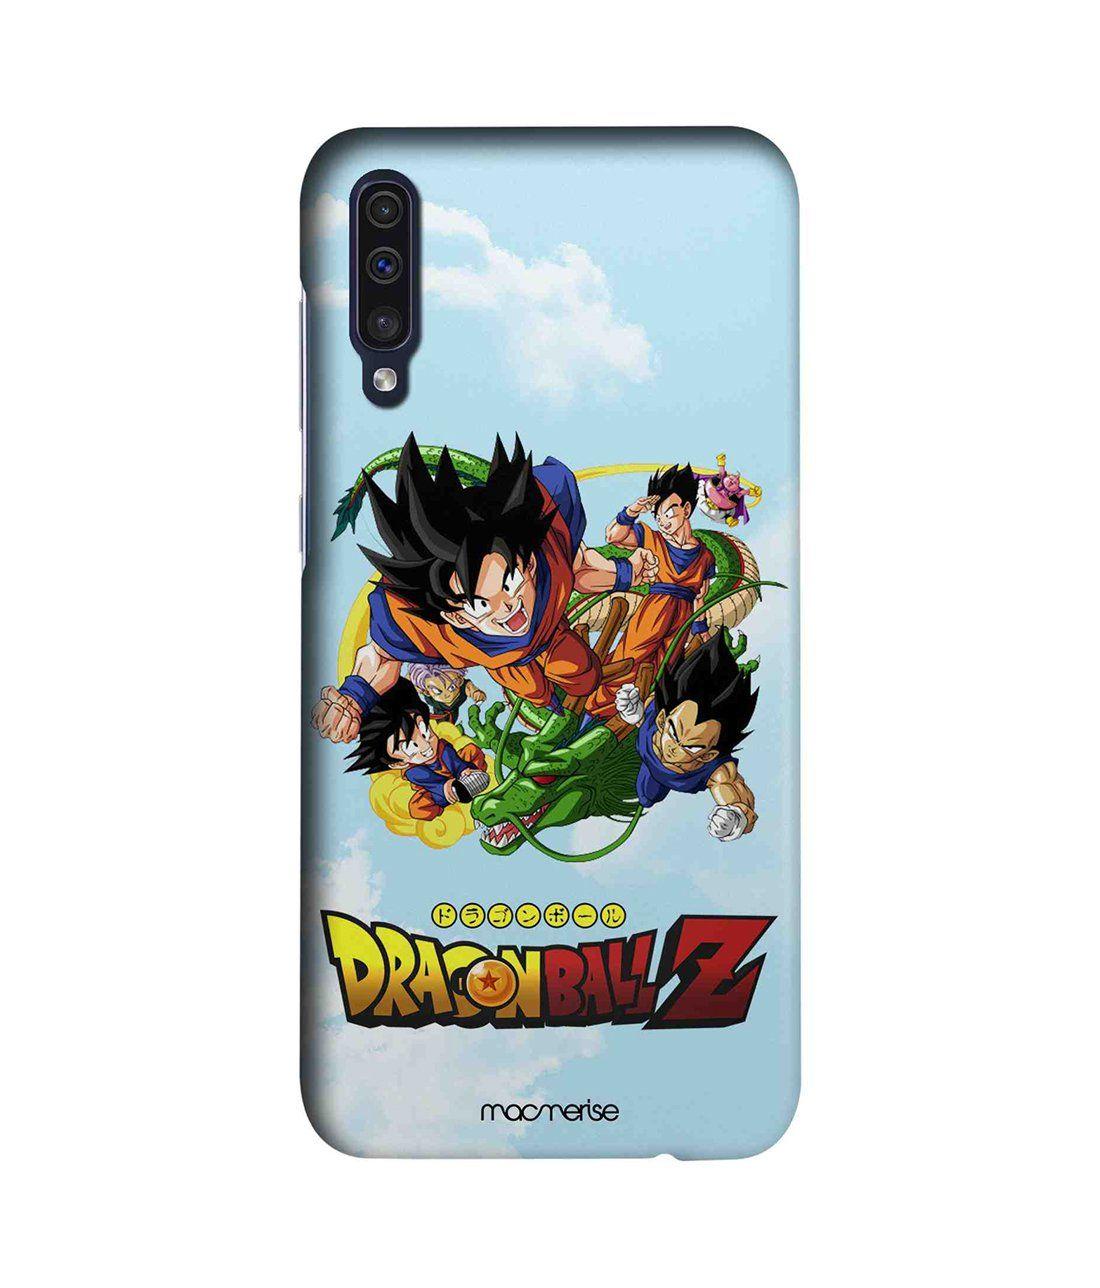 Dragon ball Z - Sleek Phone Case for Samsung A50s